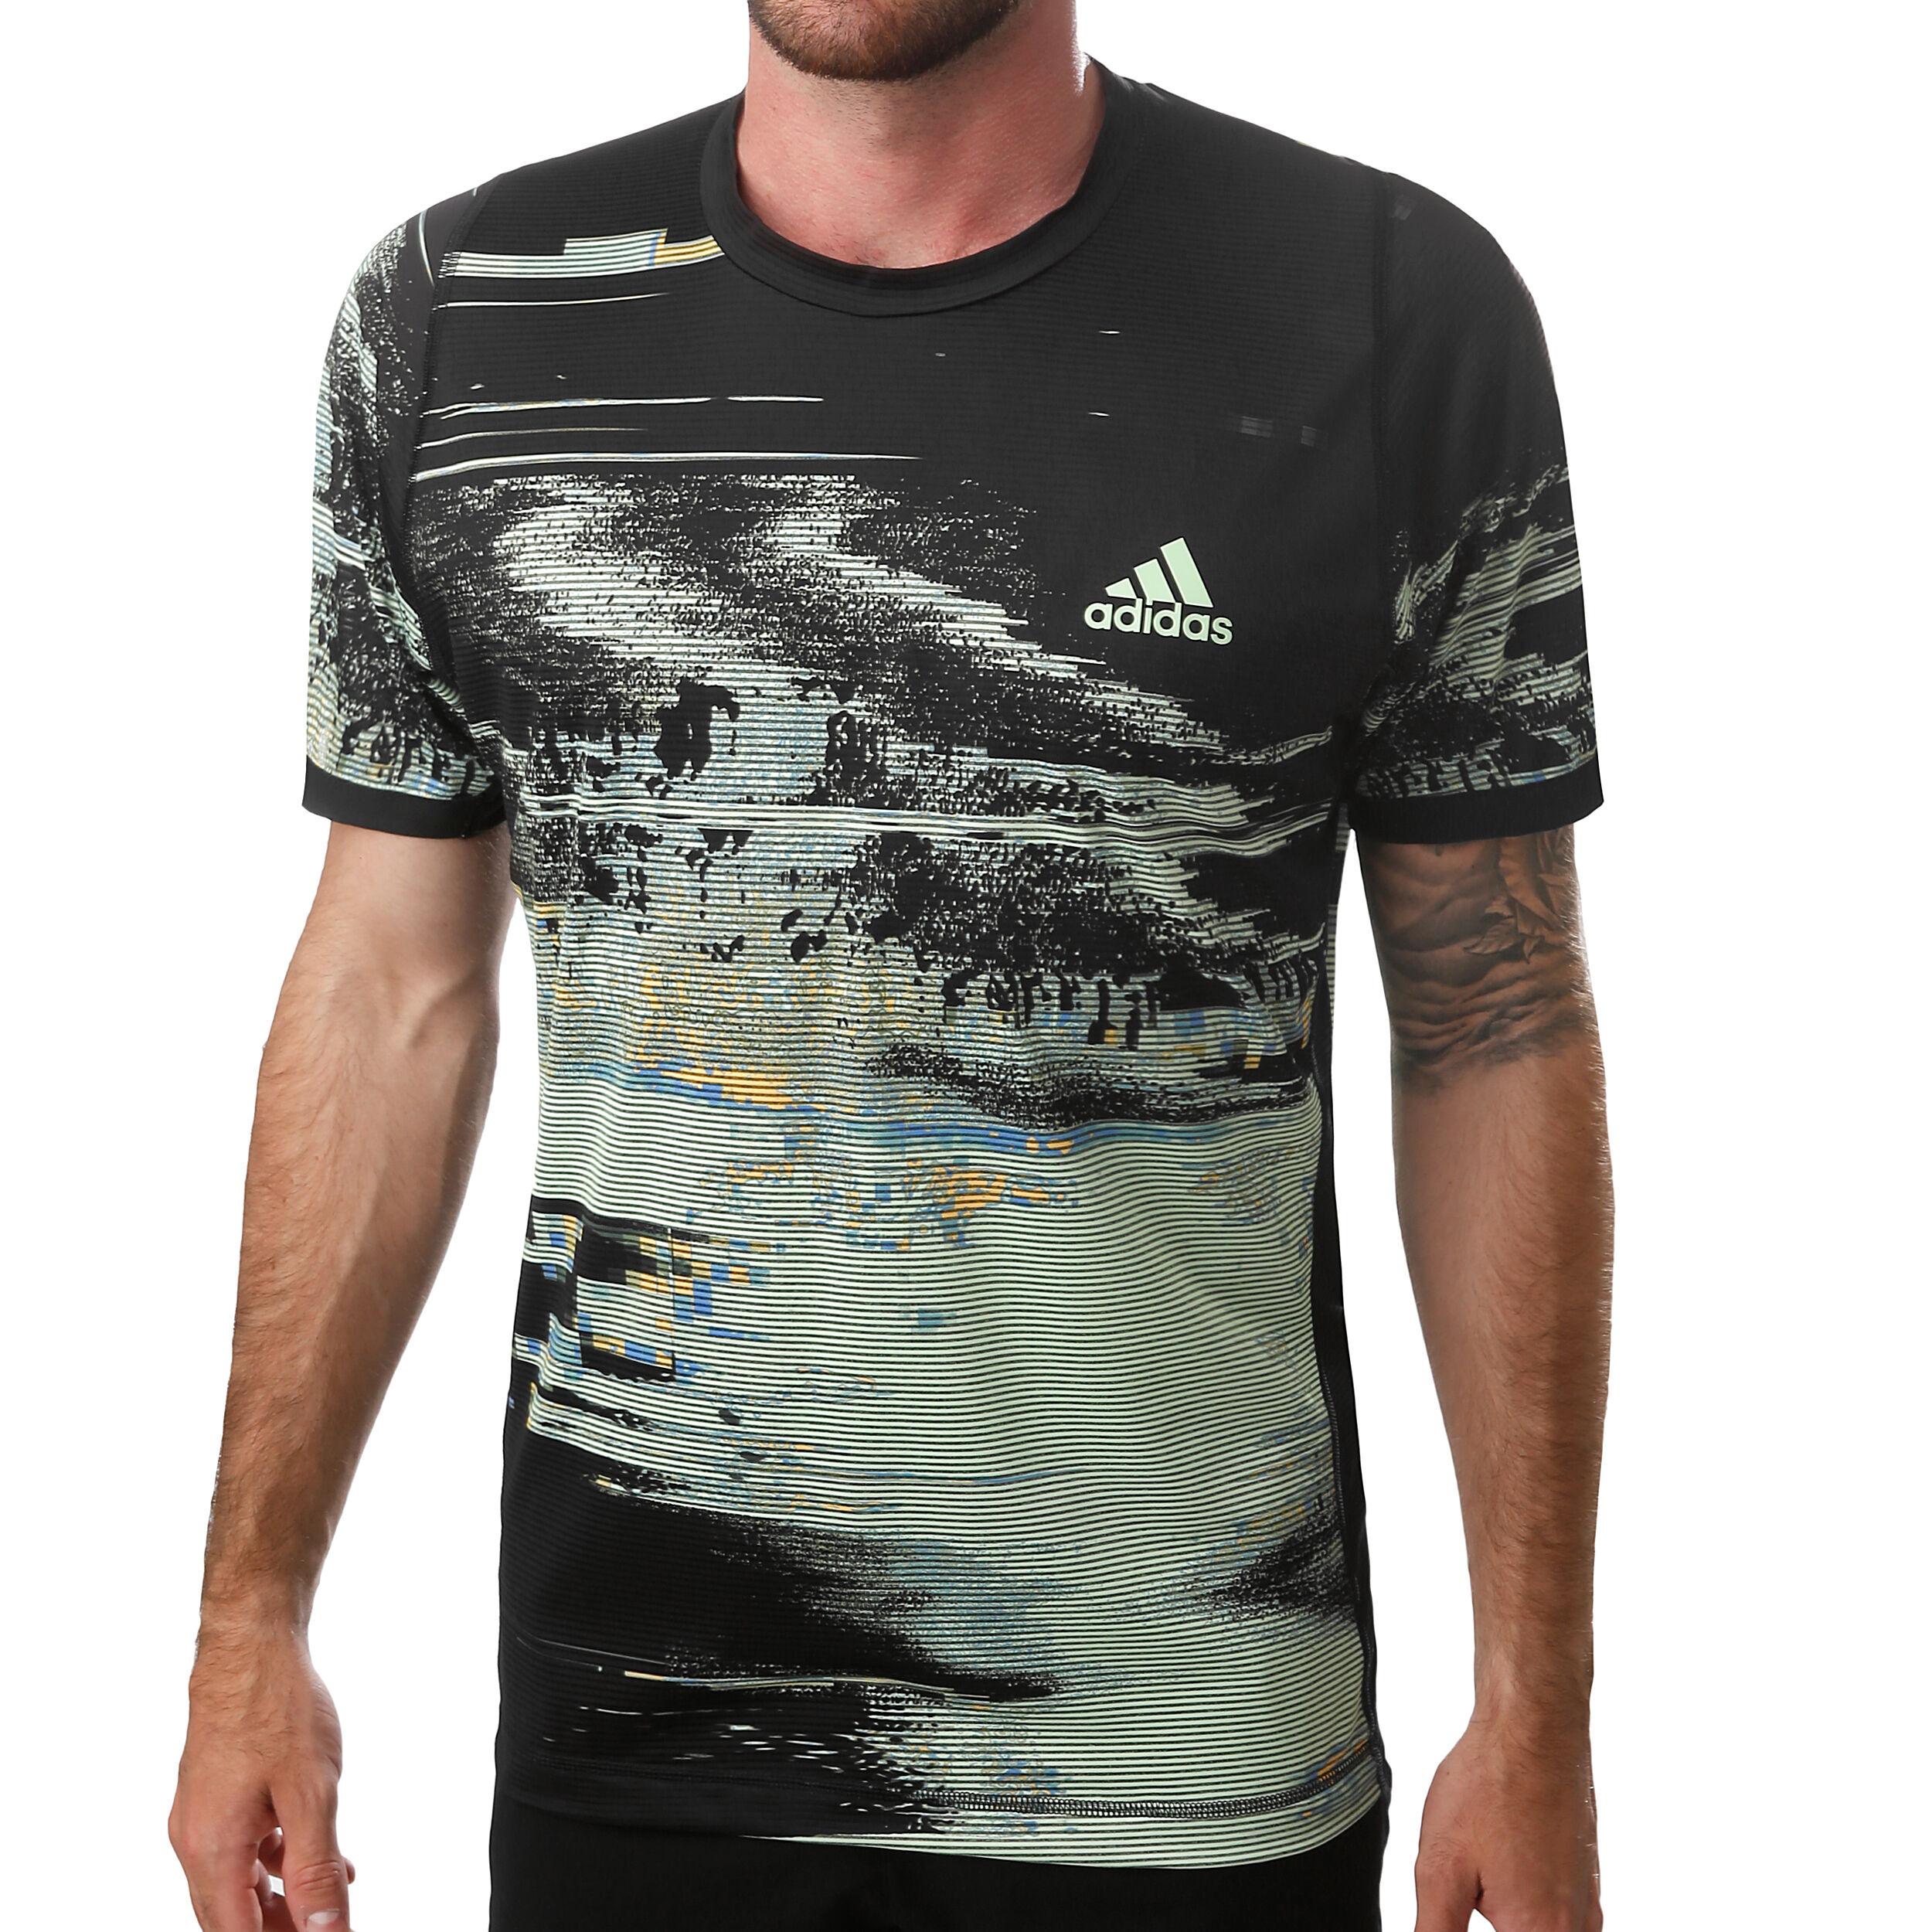 Herren T Shirt adidas Barricade Tee | Sportega.at